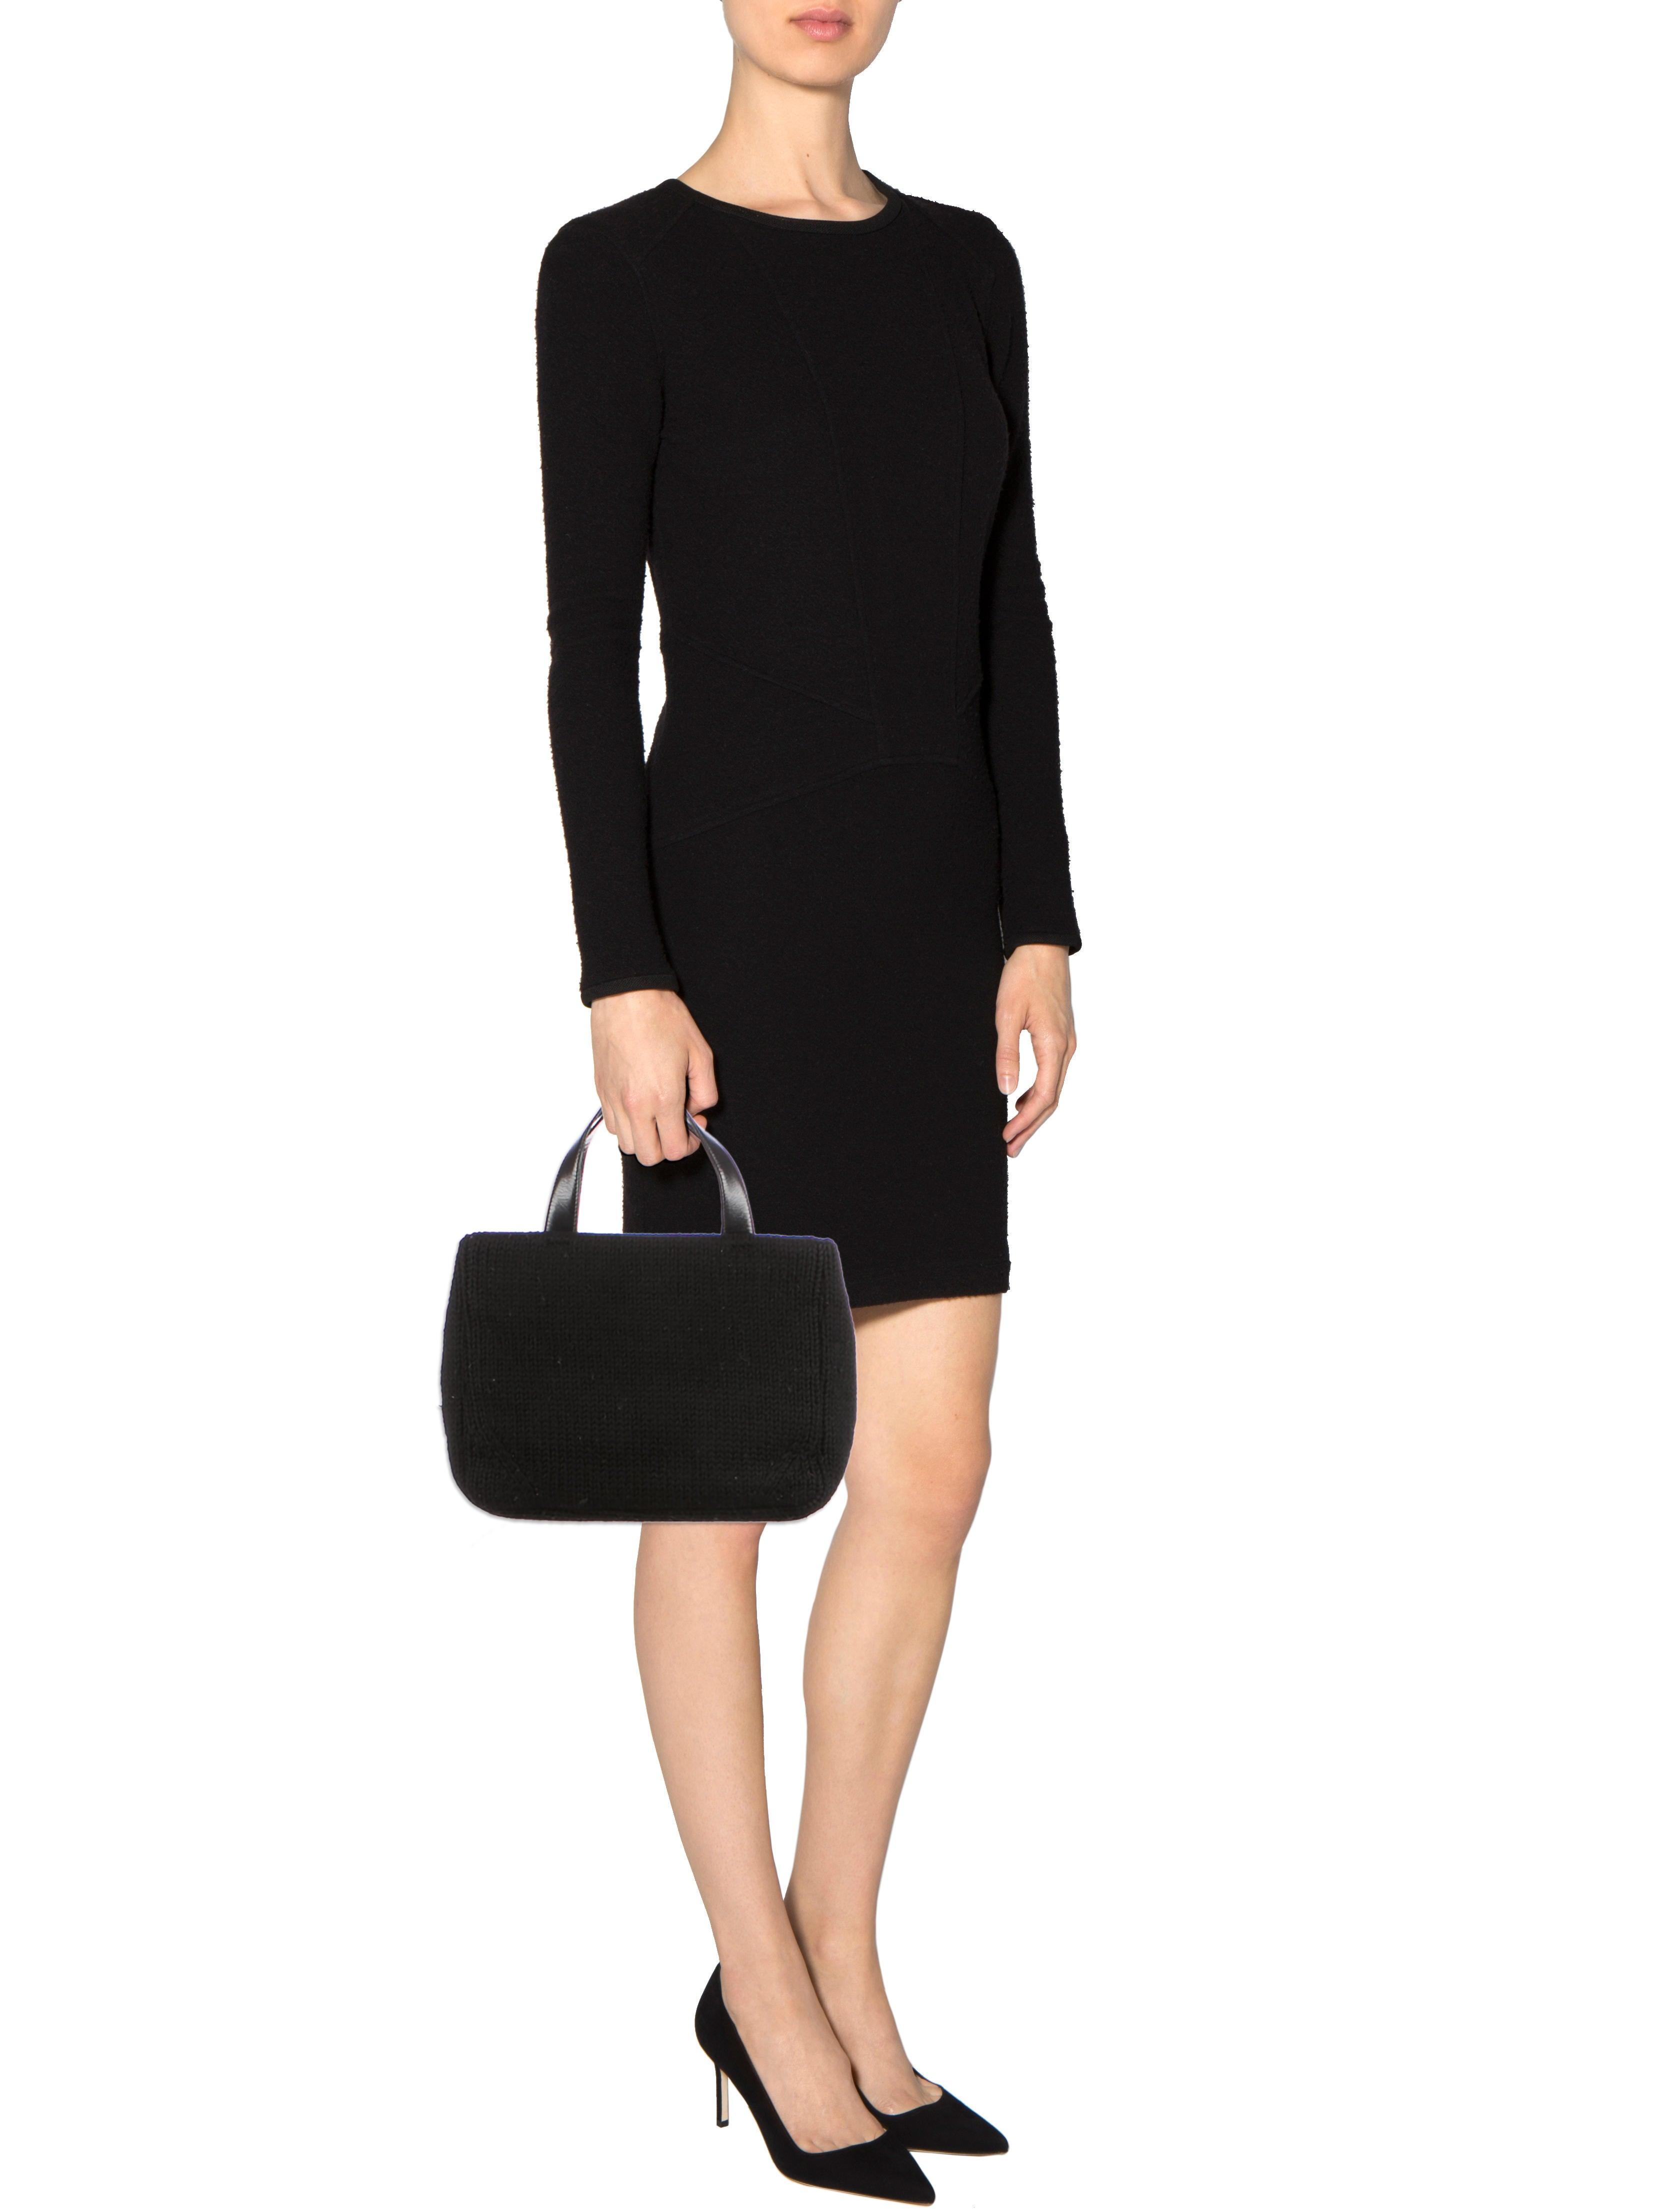 fake mens prada sunglasses - Prada Cable Knit Handle Bag - Handbags - PRA86224 | The RealReal